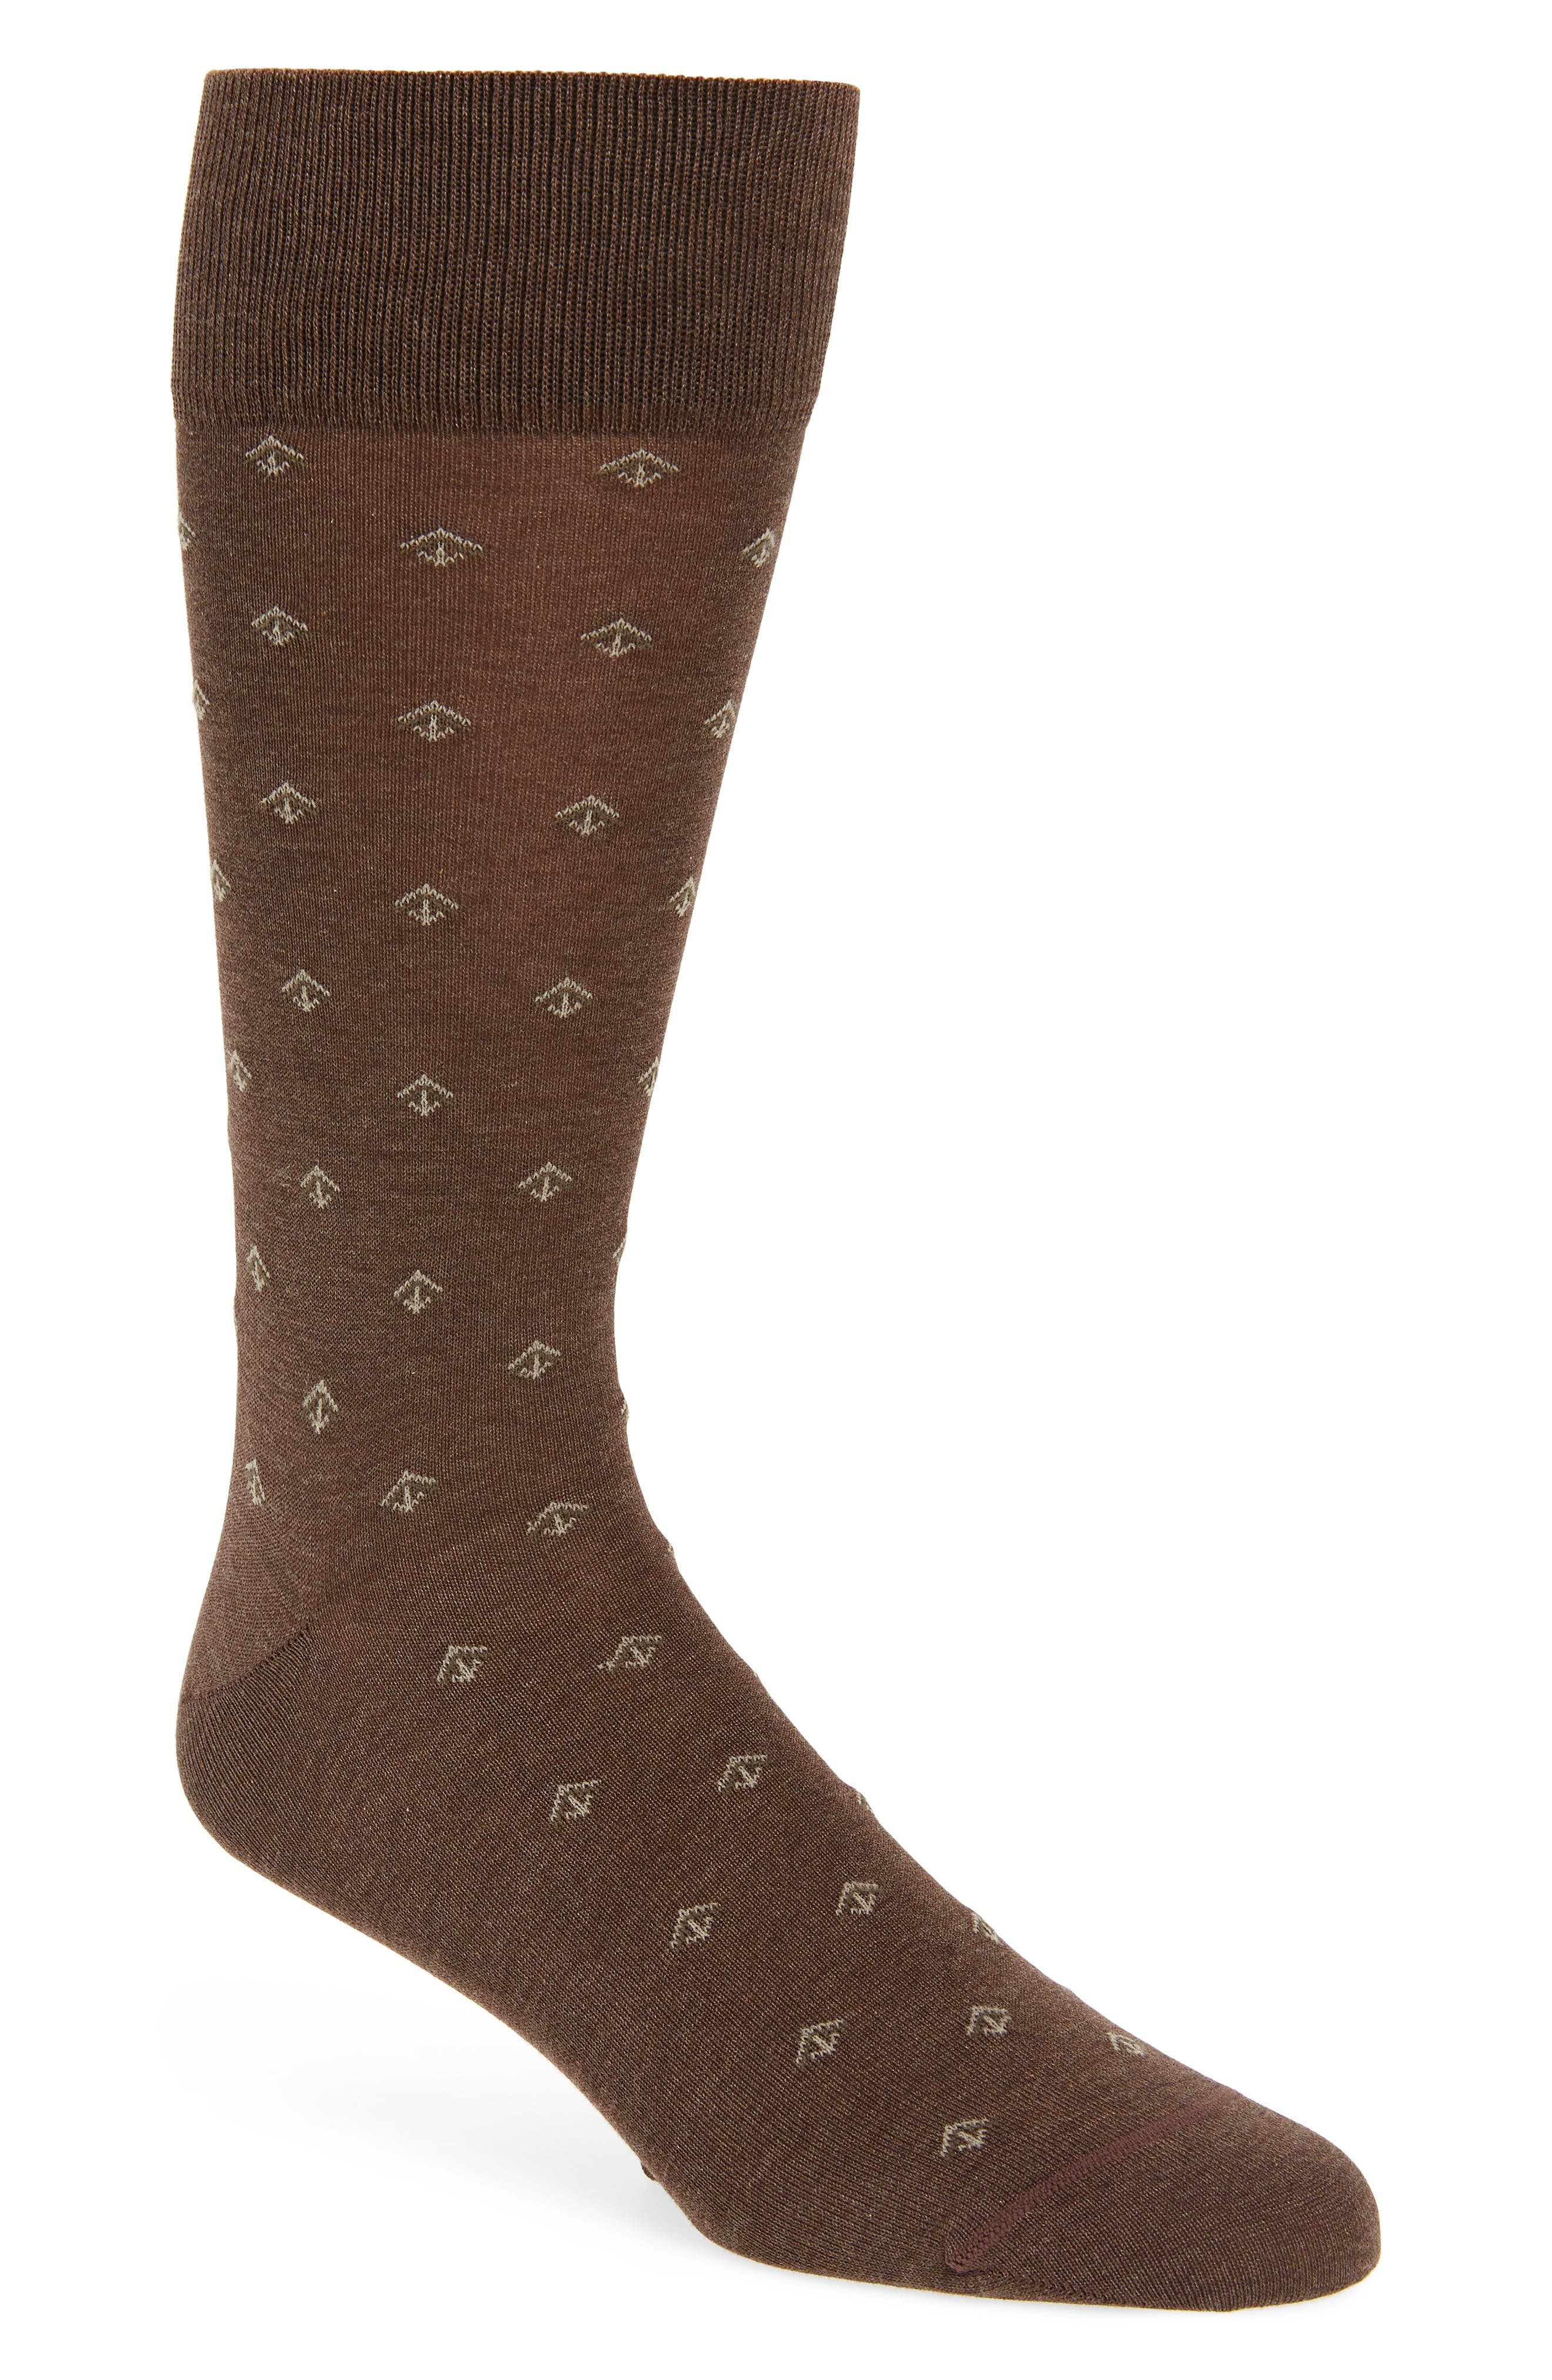 Cascading Arrows Socks,                             Main thumbnail 1, color,                             Brown Heather